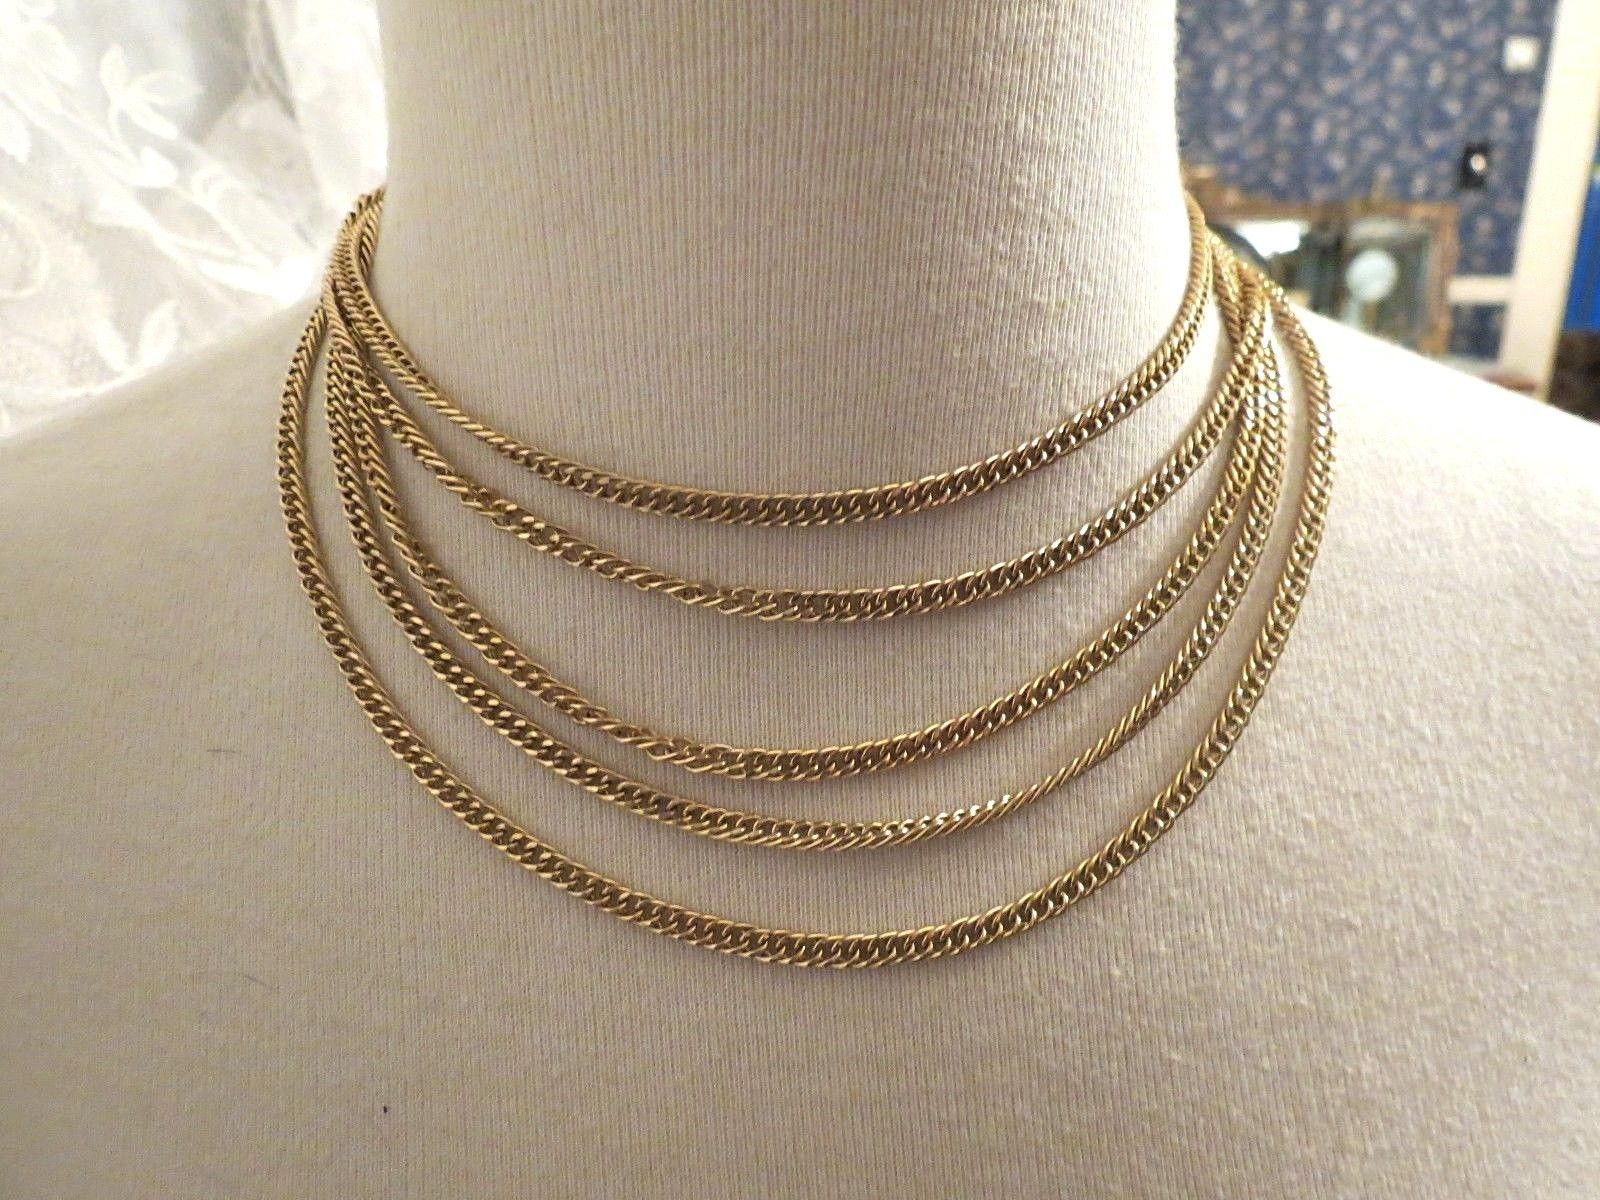 VTG Couture Trifari Necklace Mult Chain Gold Plated Designer Fancy Leaf Catch